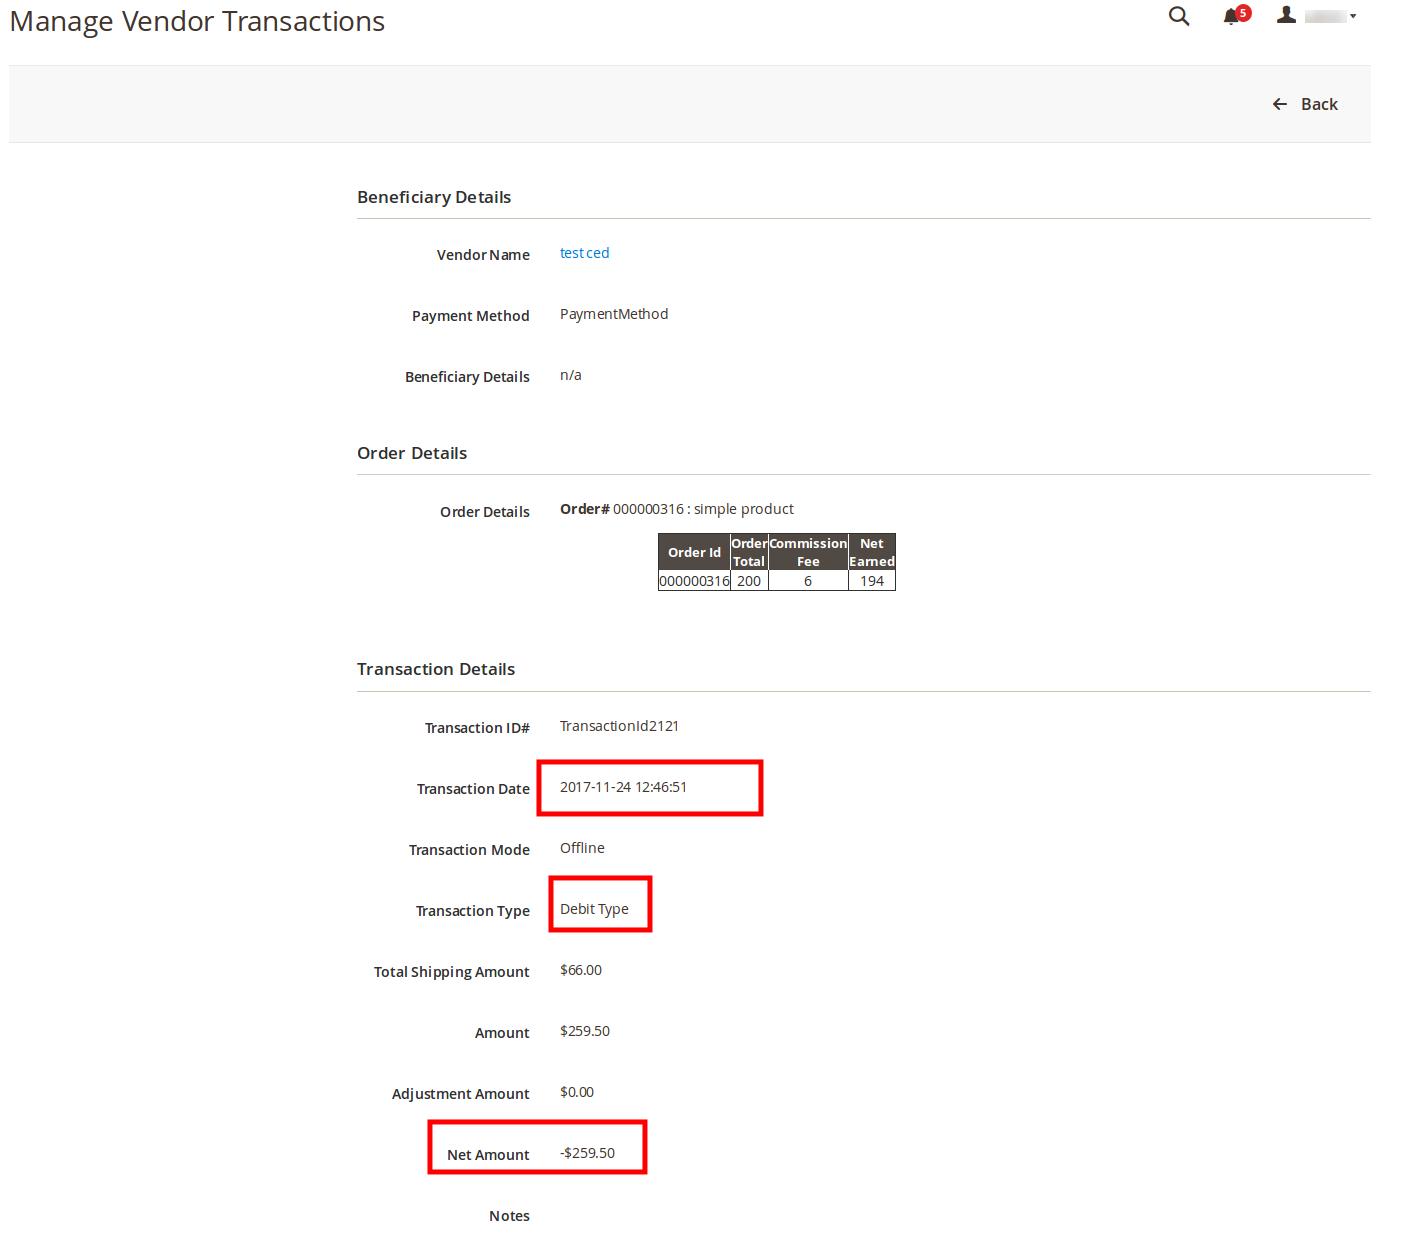 ManageVendorTransactions_TRansactionDetails